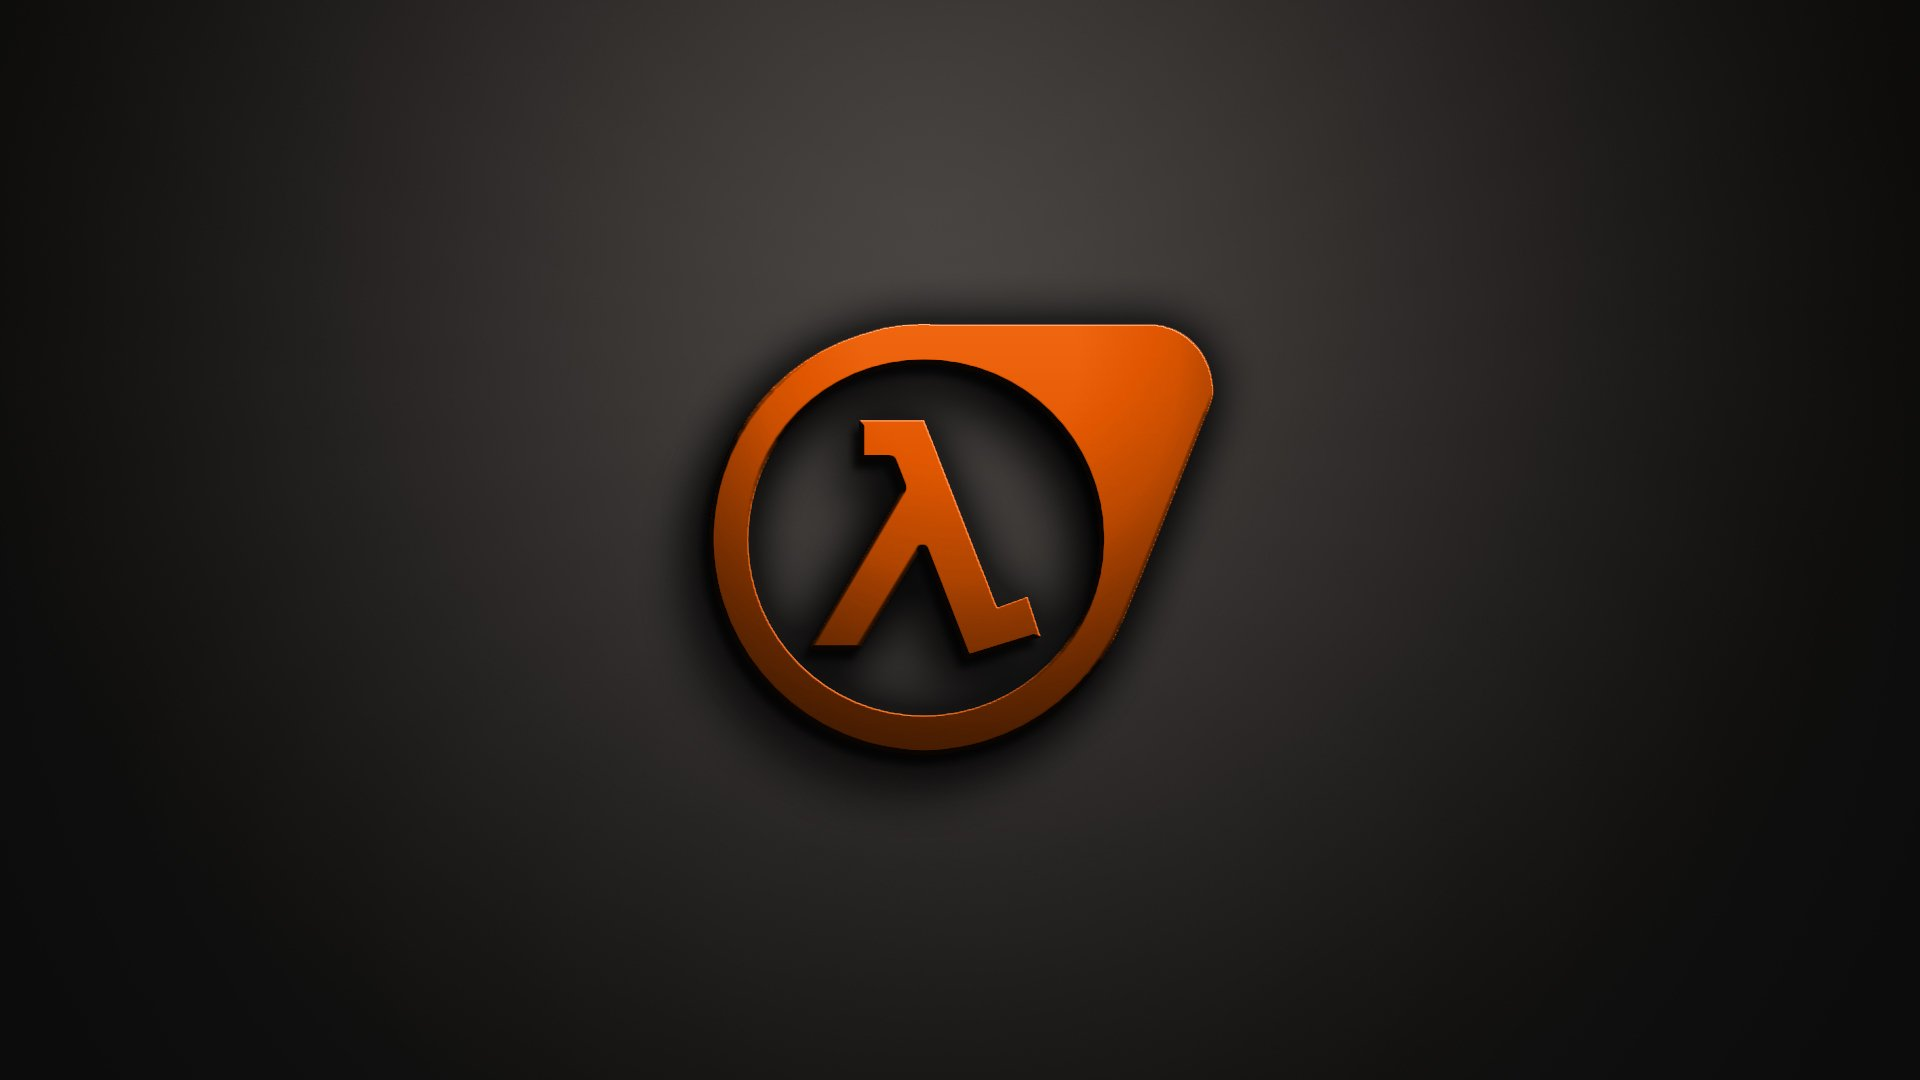 Half Life Iphone Wallpaper: Half-Life 3 Full HD Wallpaper And Background Image